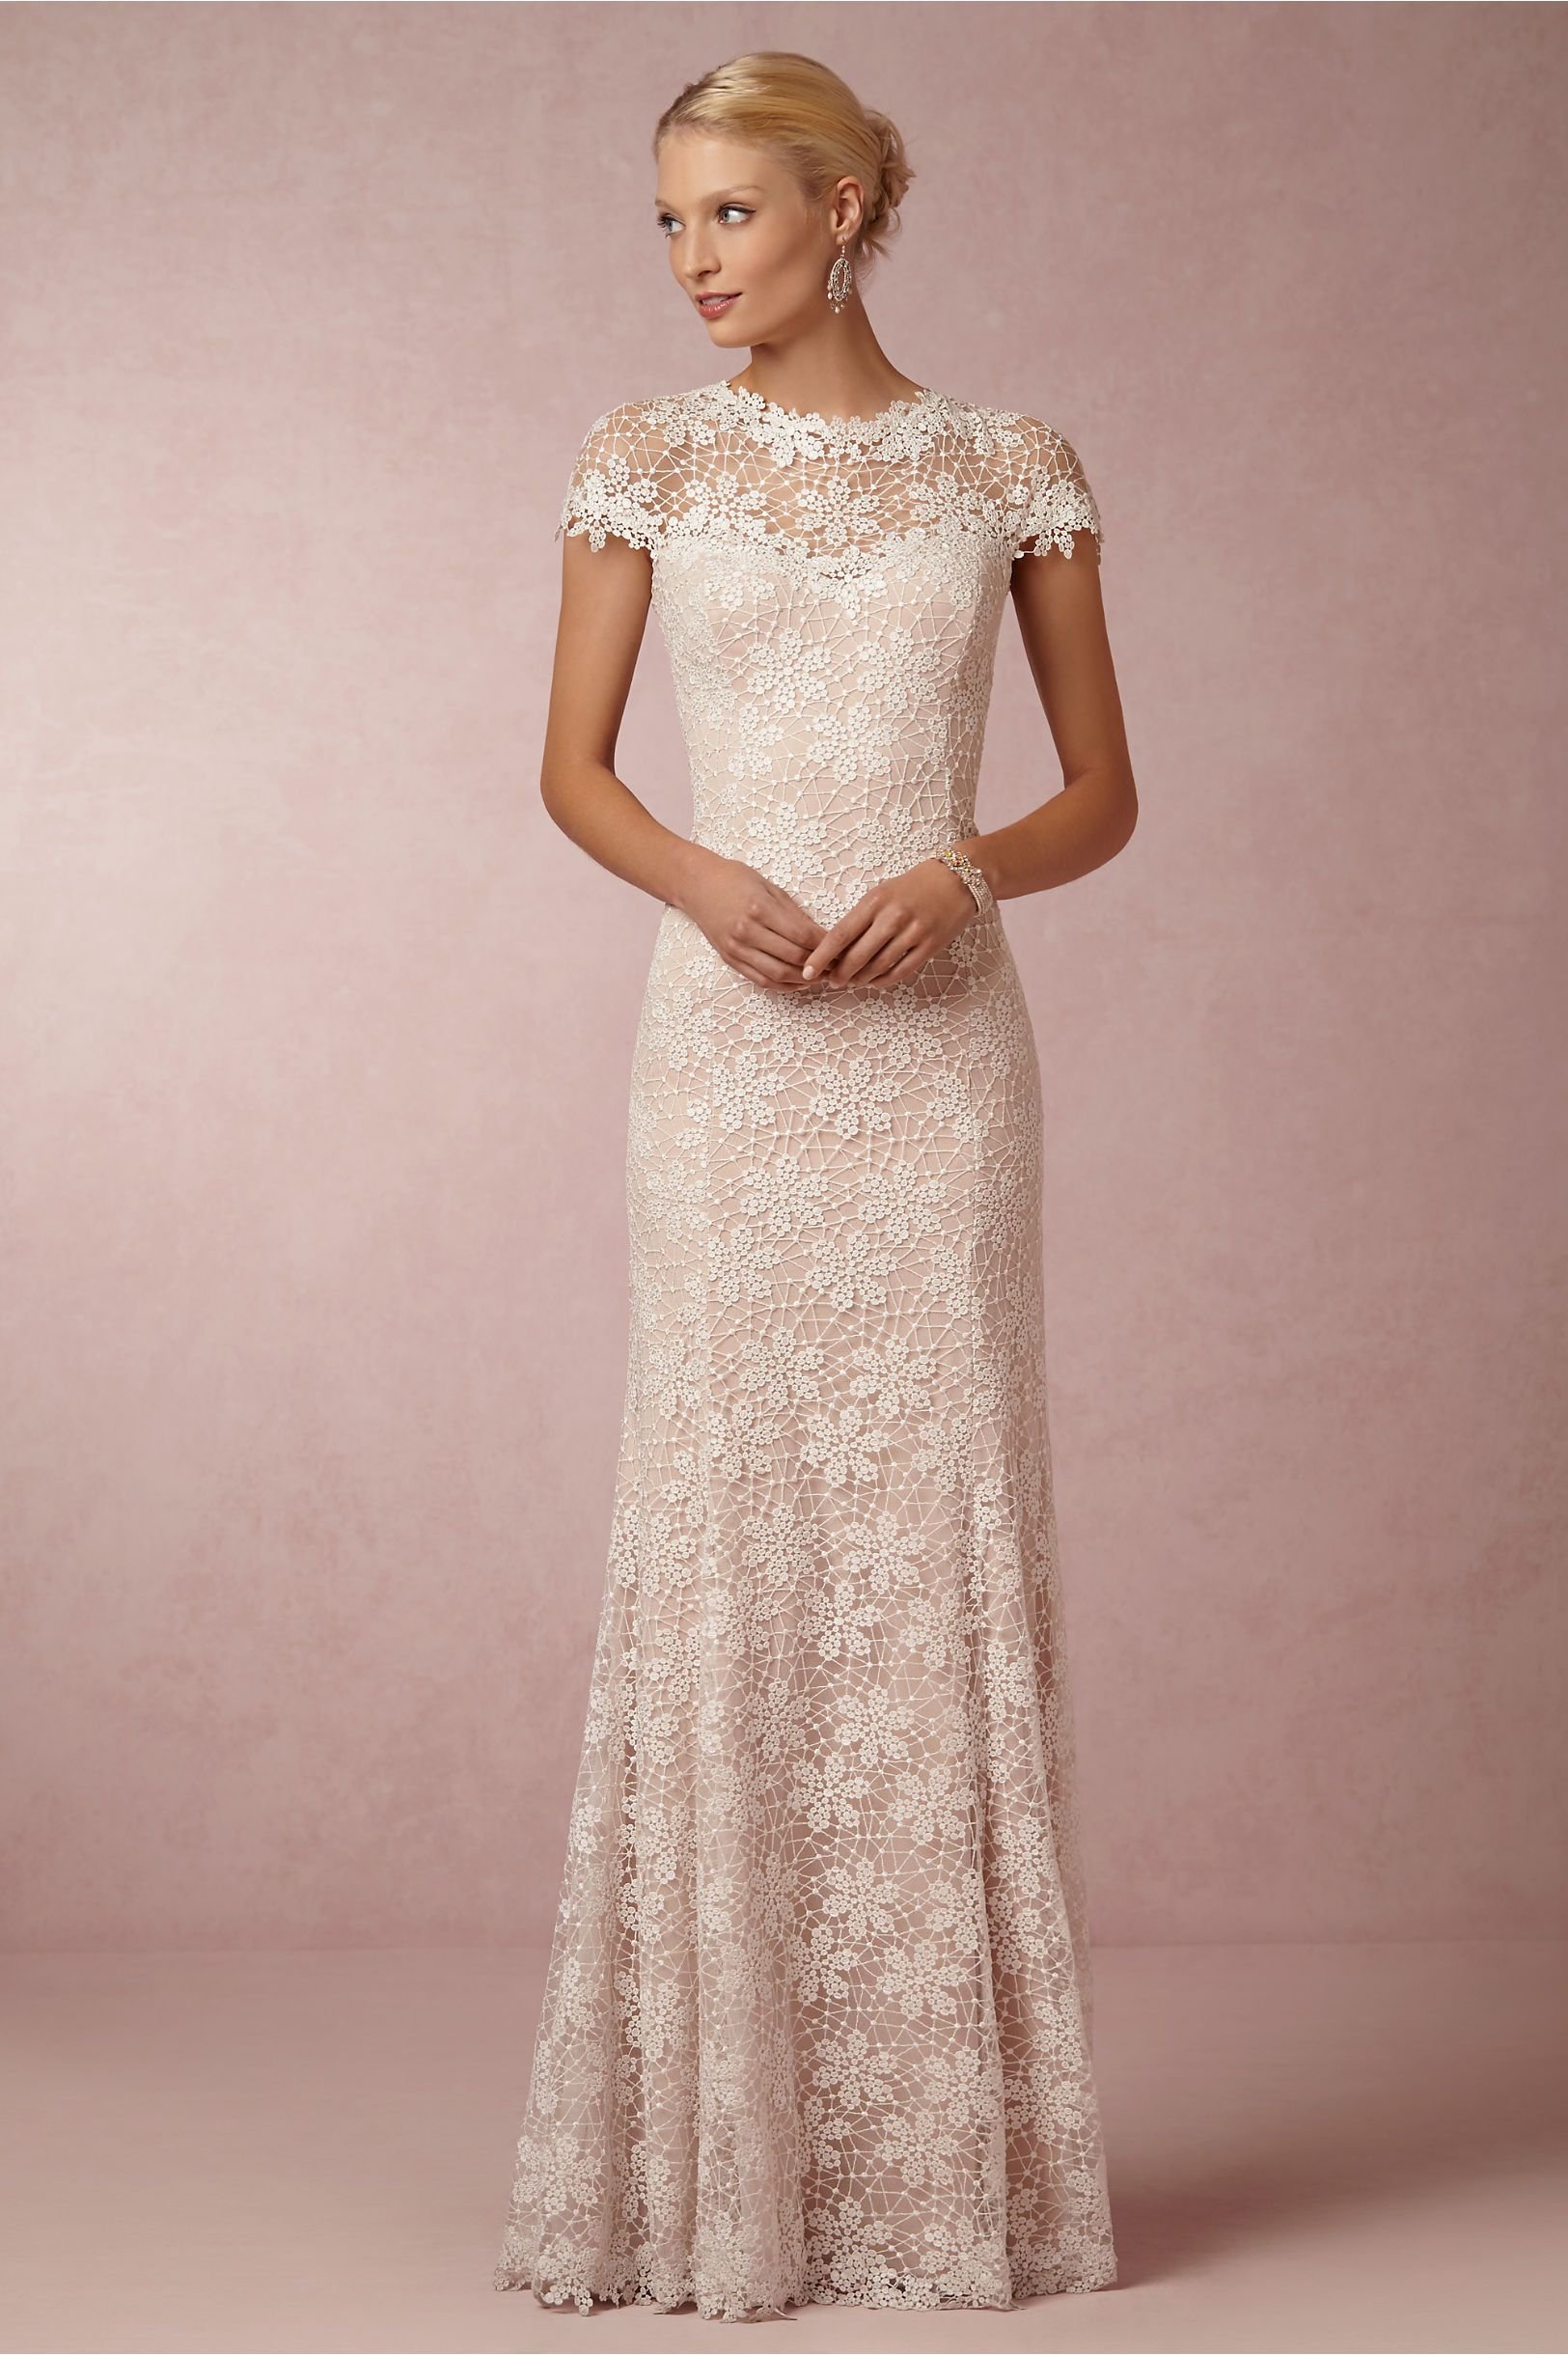 Nova lace gown by tadashi shoji for bhldn winter wedding ideas nova lace gown by tadashi shoji for bhldn ombrellifo Image collections